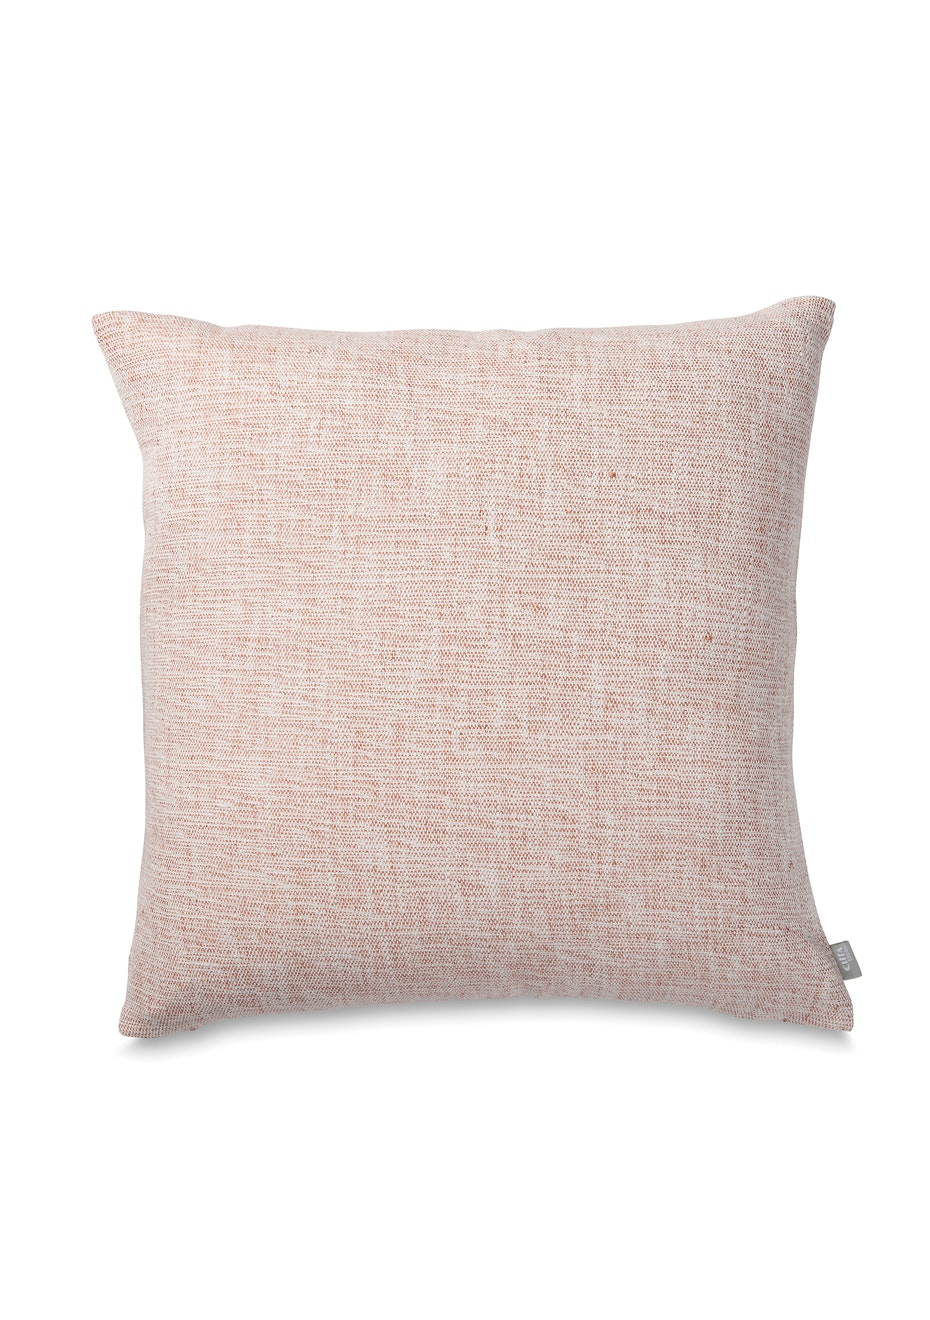 Città - Dolce Linen Cushion Cover - Light Rust